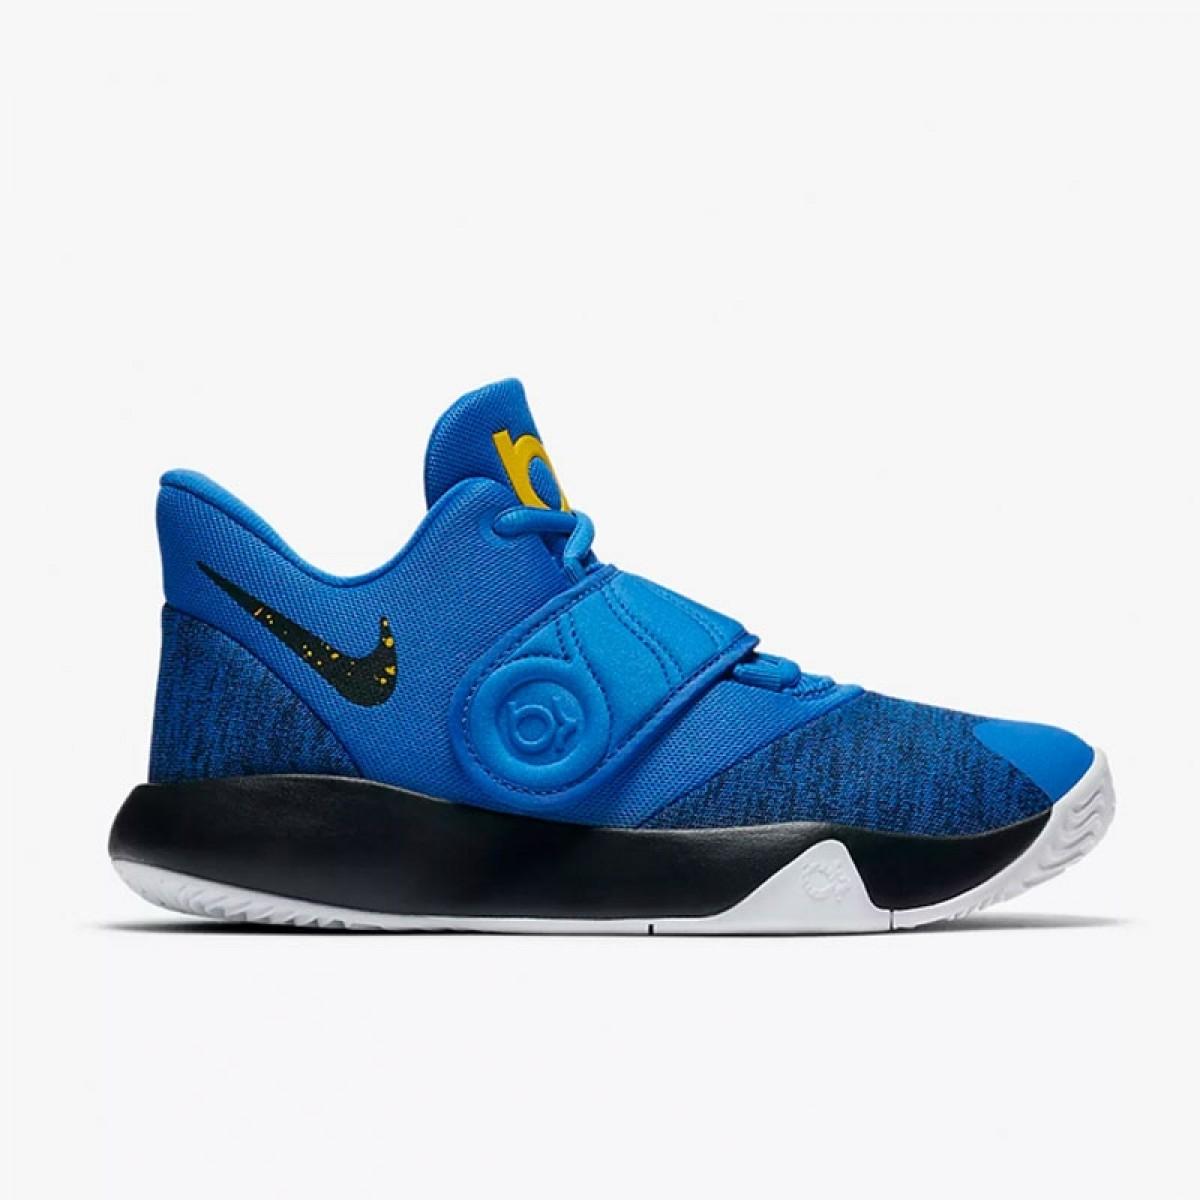 Nike KD Trey 5 VI GS 'Warriors'